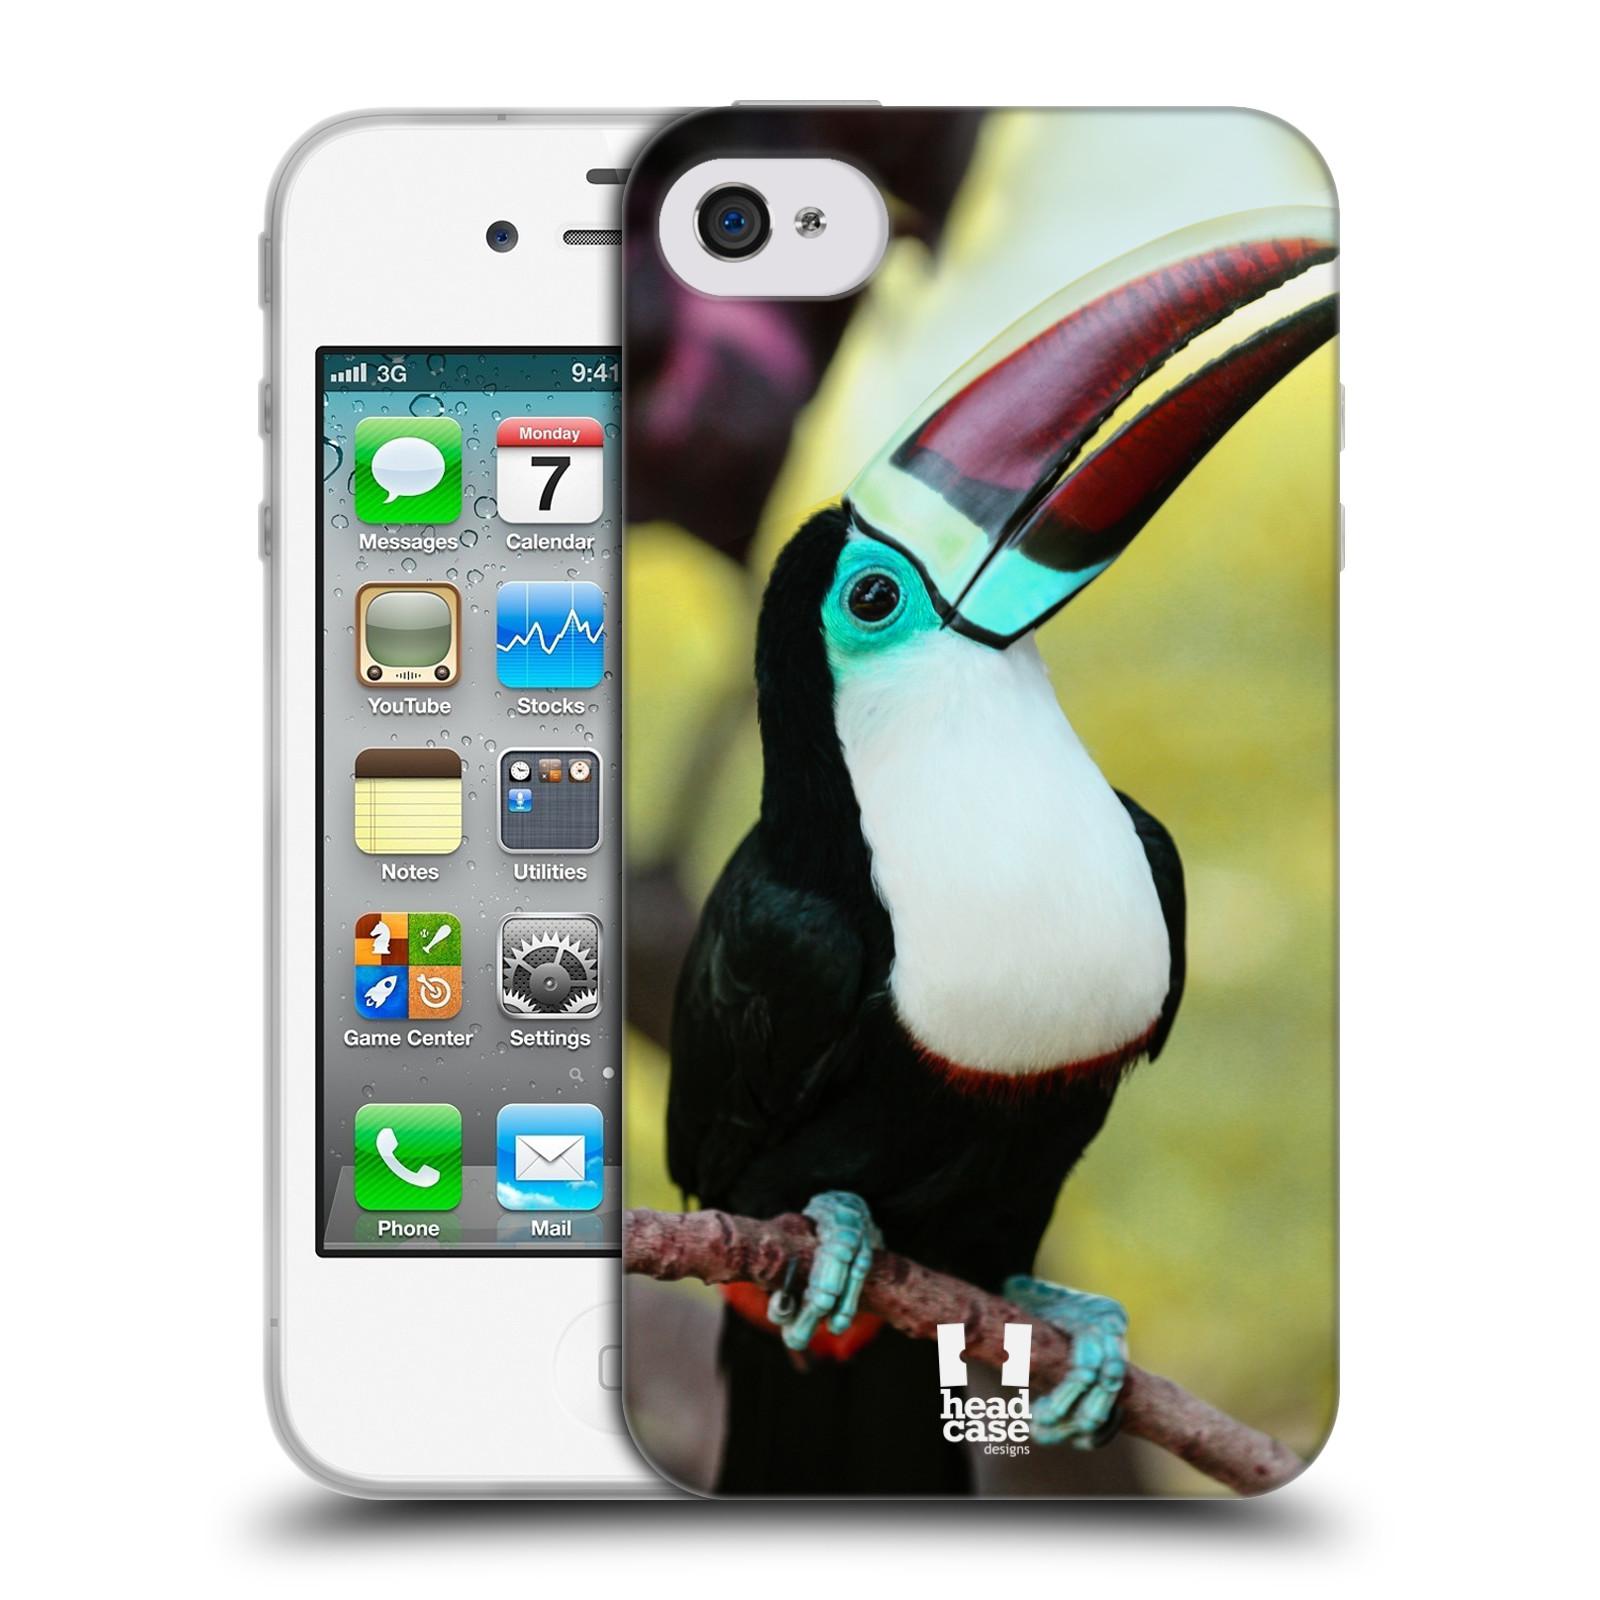 HEAD CASE silikonový obal na mobil Apple Iphone 4/4S vzor slavná zvířata foto tukan